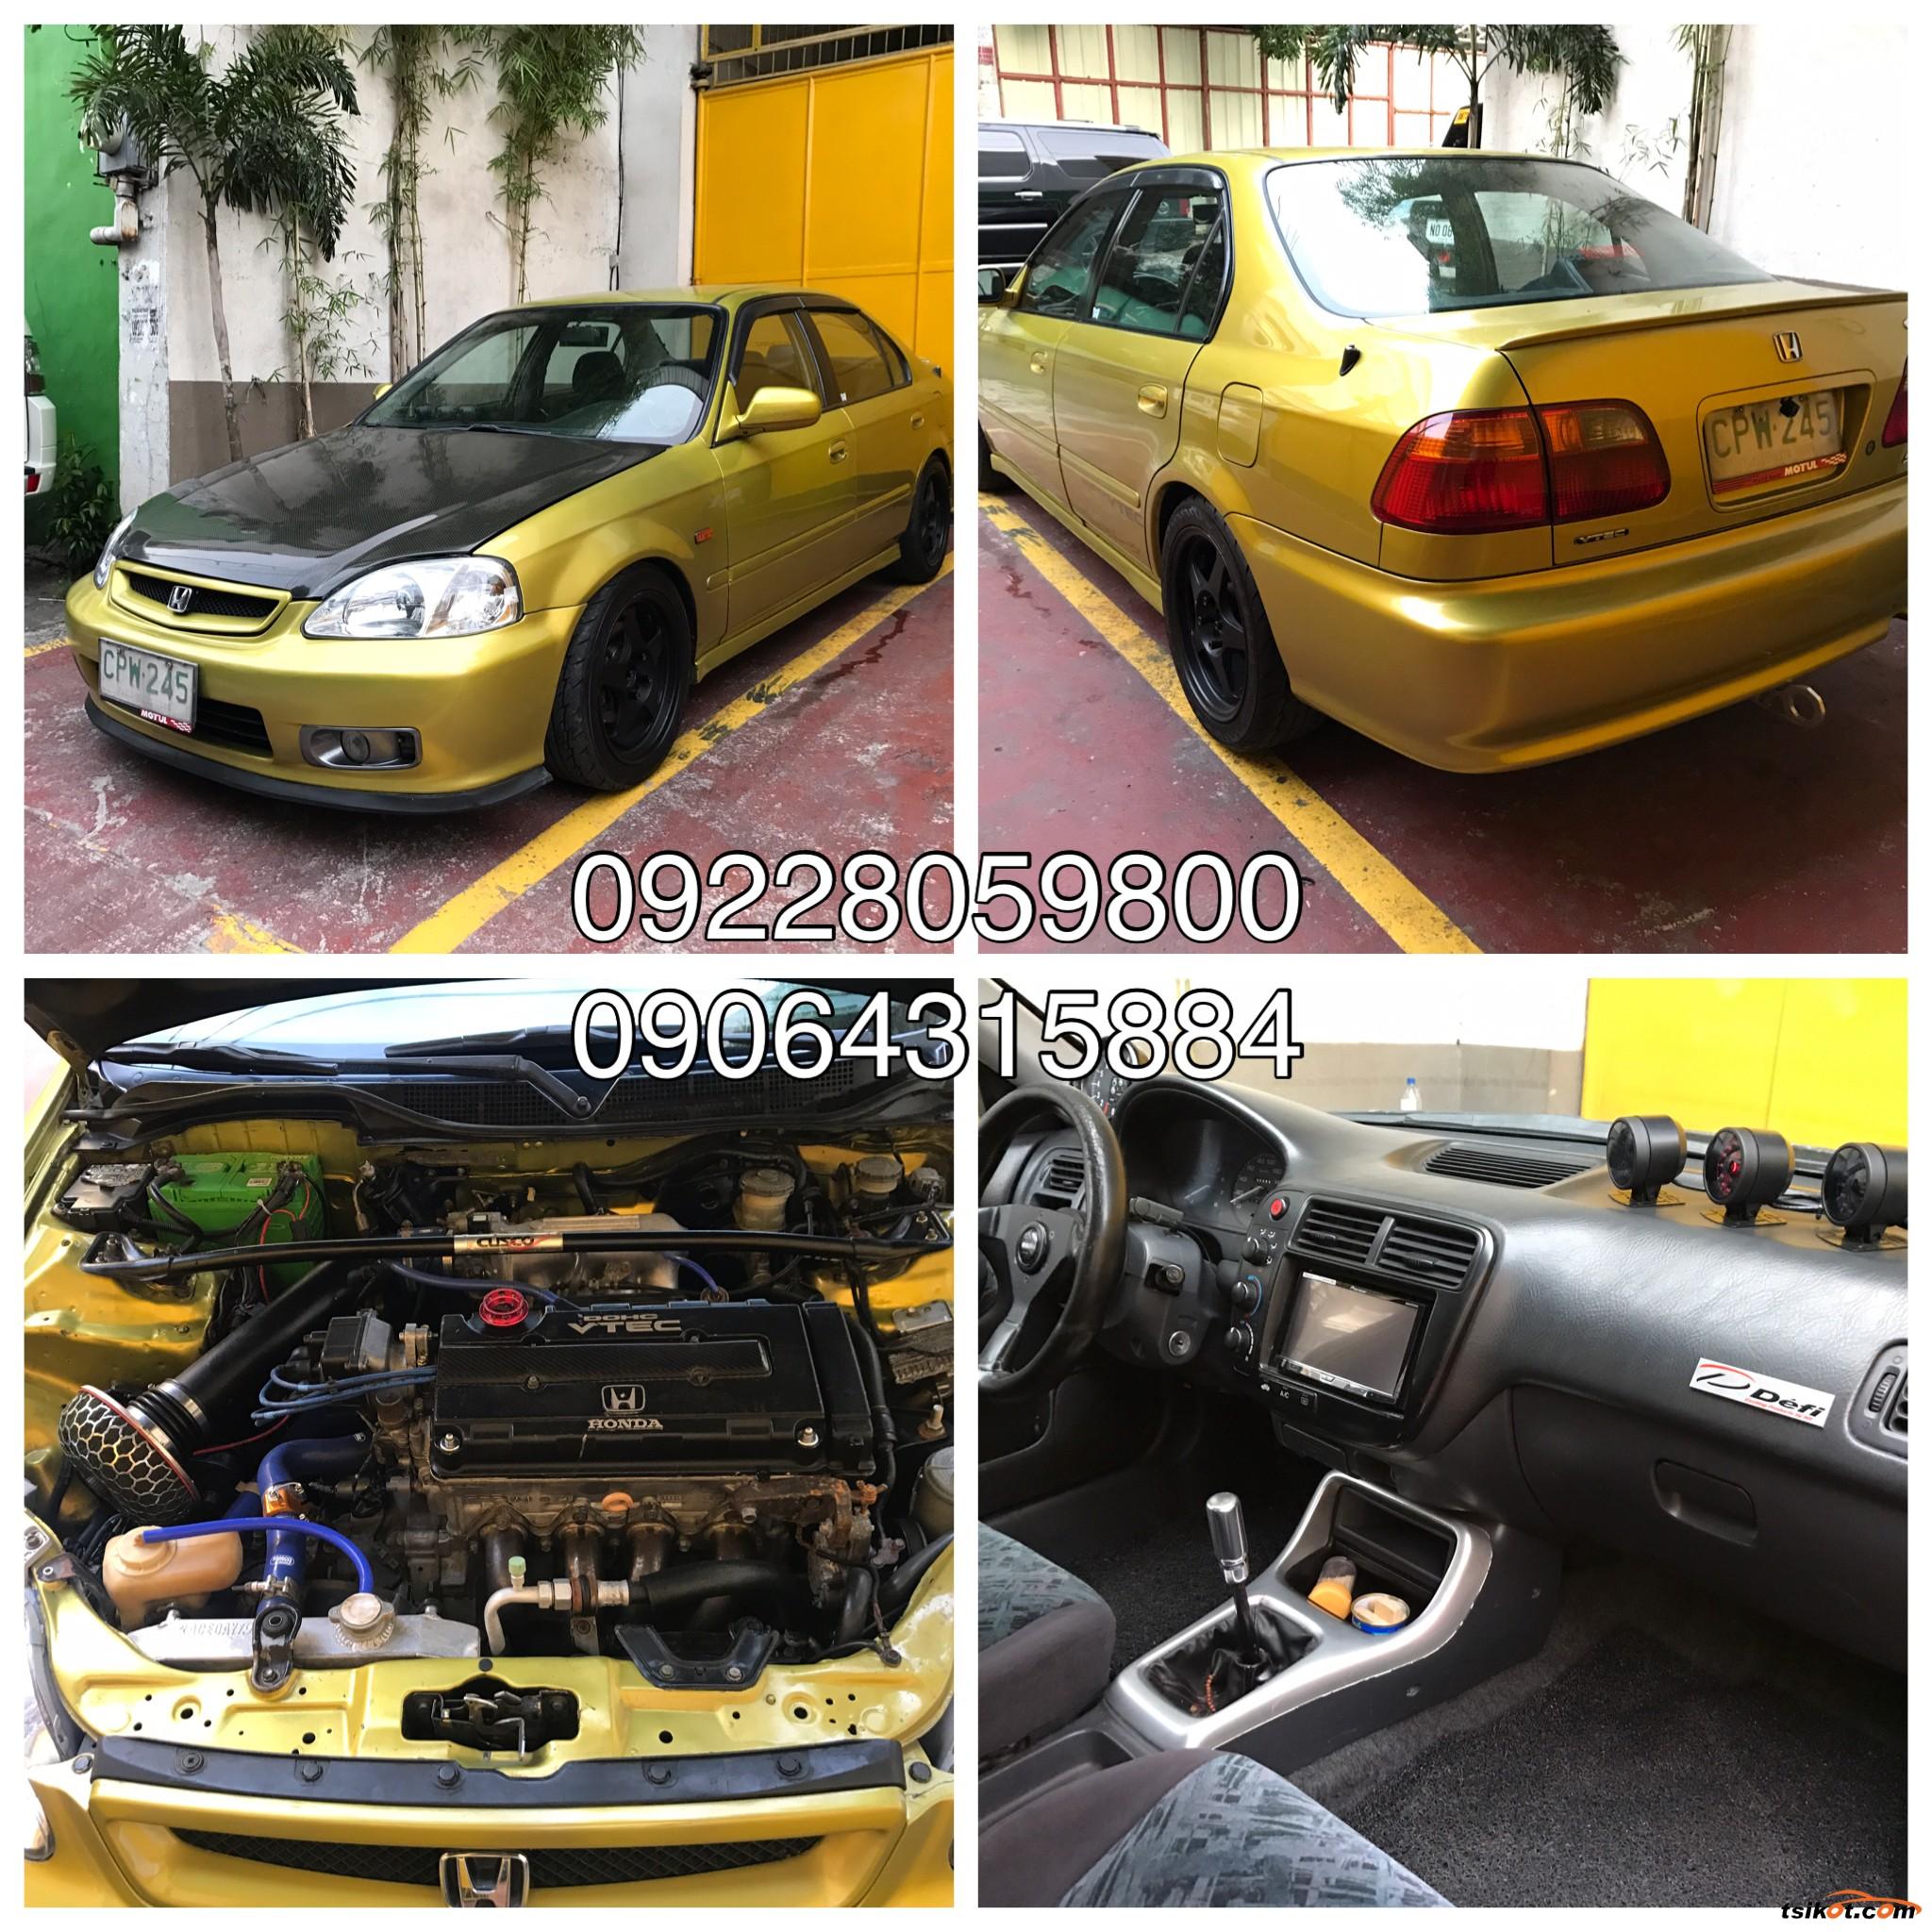 Honda Civic 2000 - Car for Sale Metro Manila